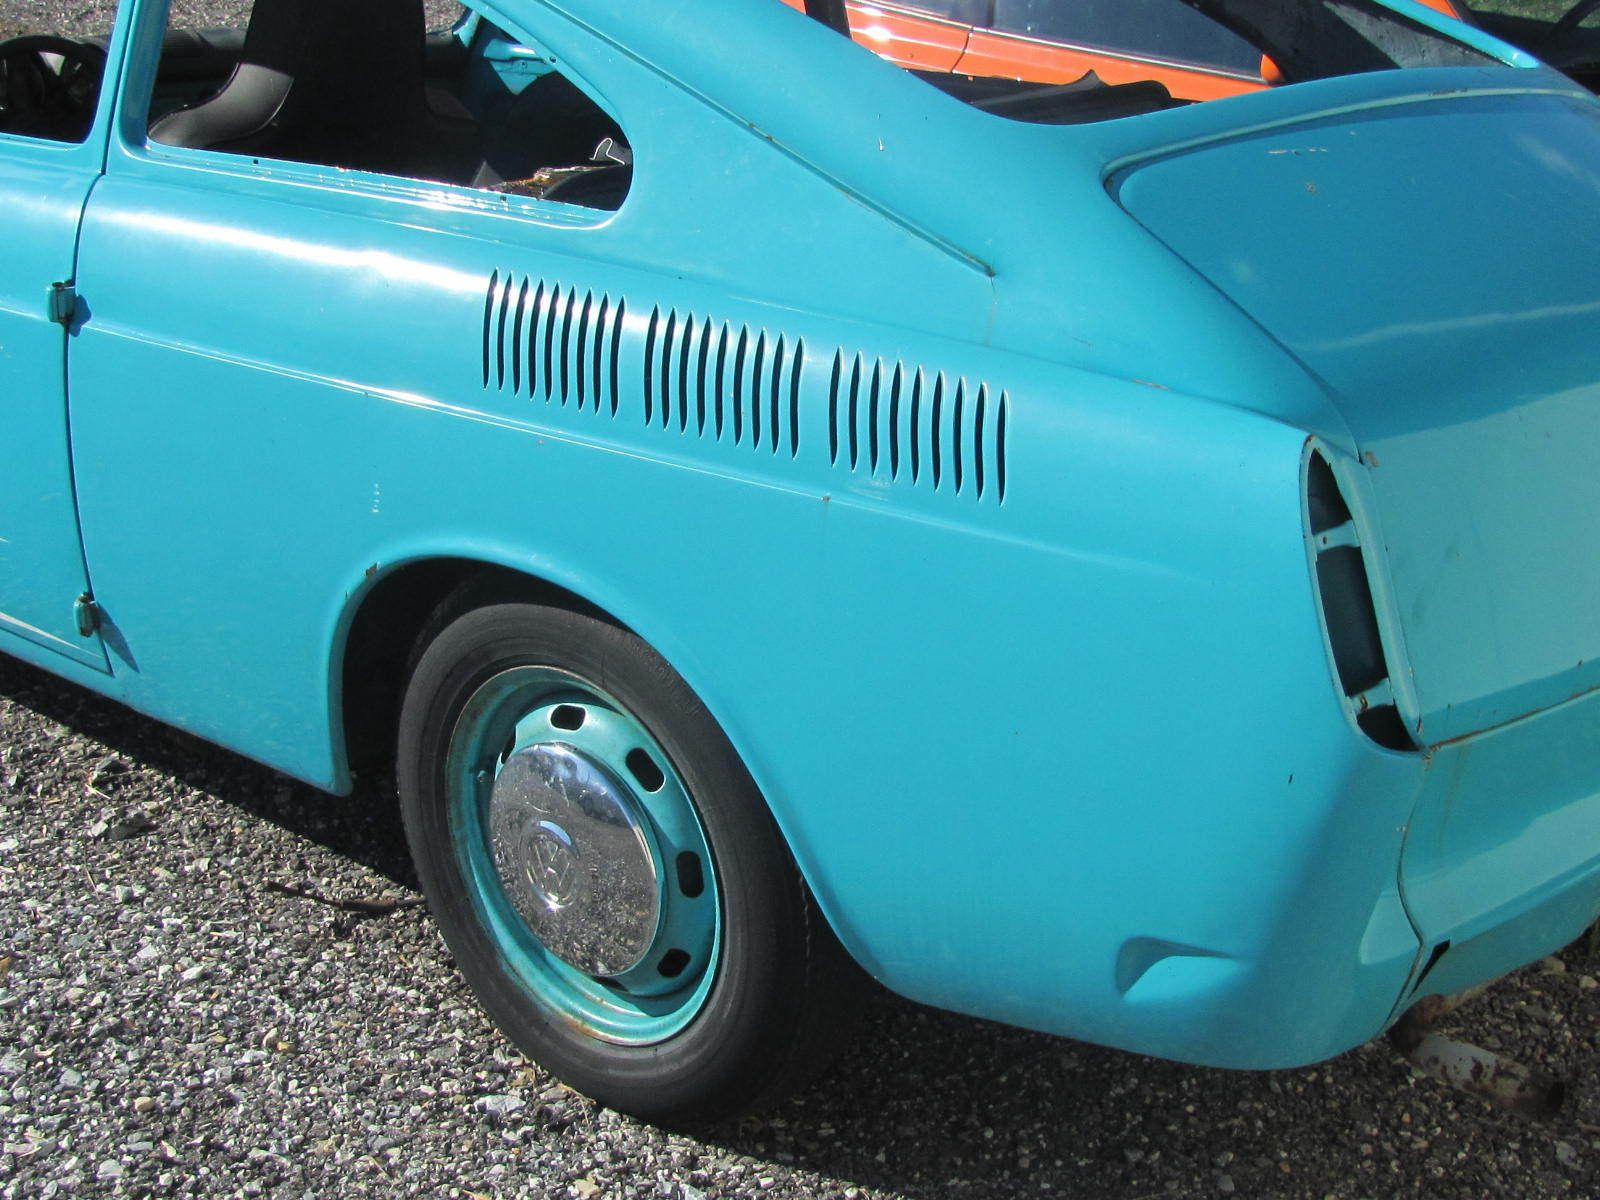 Enchanting Us Ebay Motors Component - Classic Cars Ideas - boiq.info